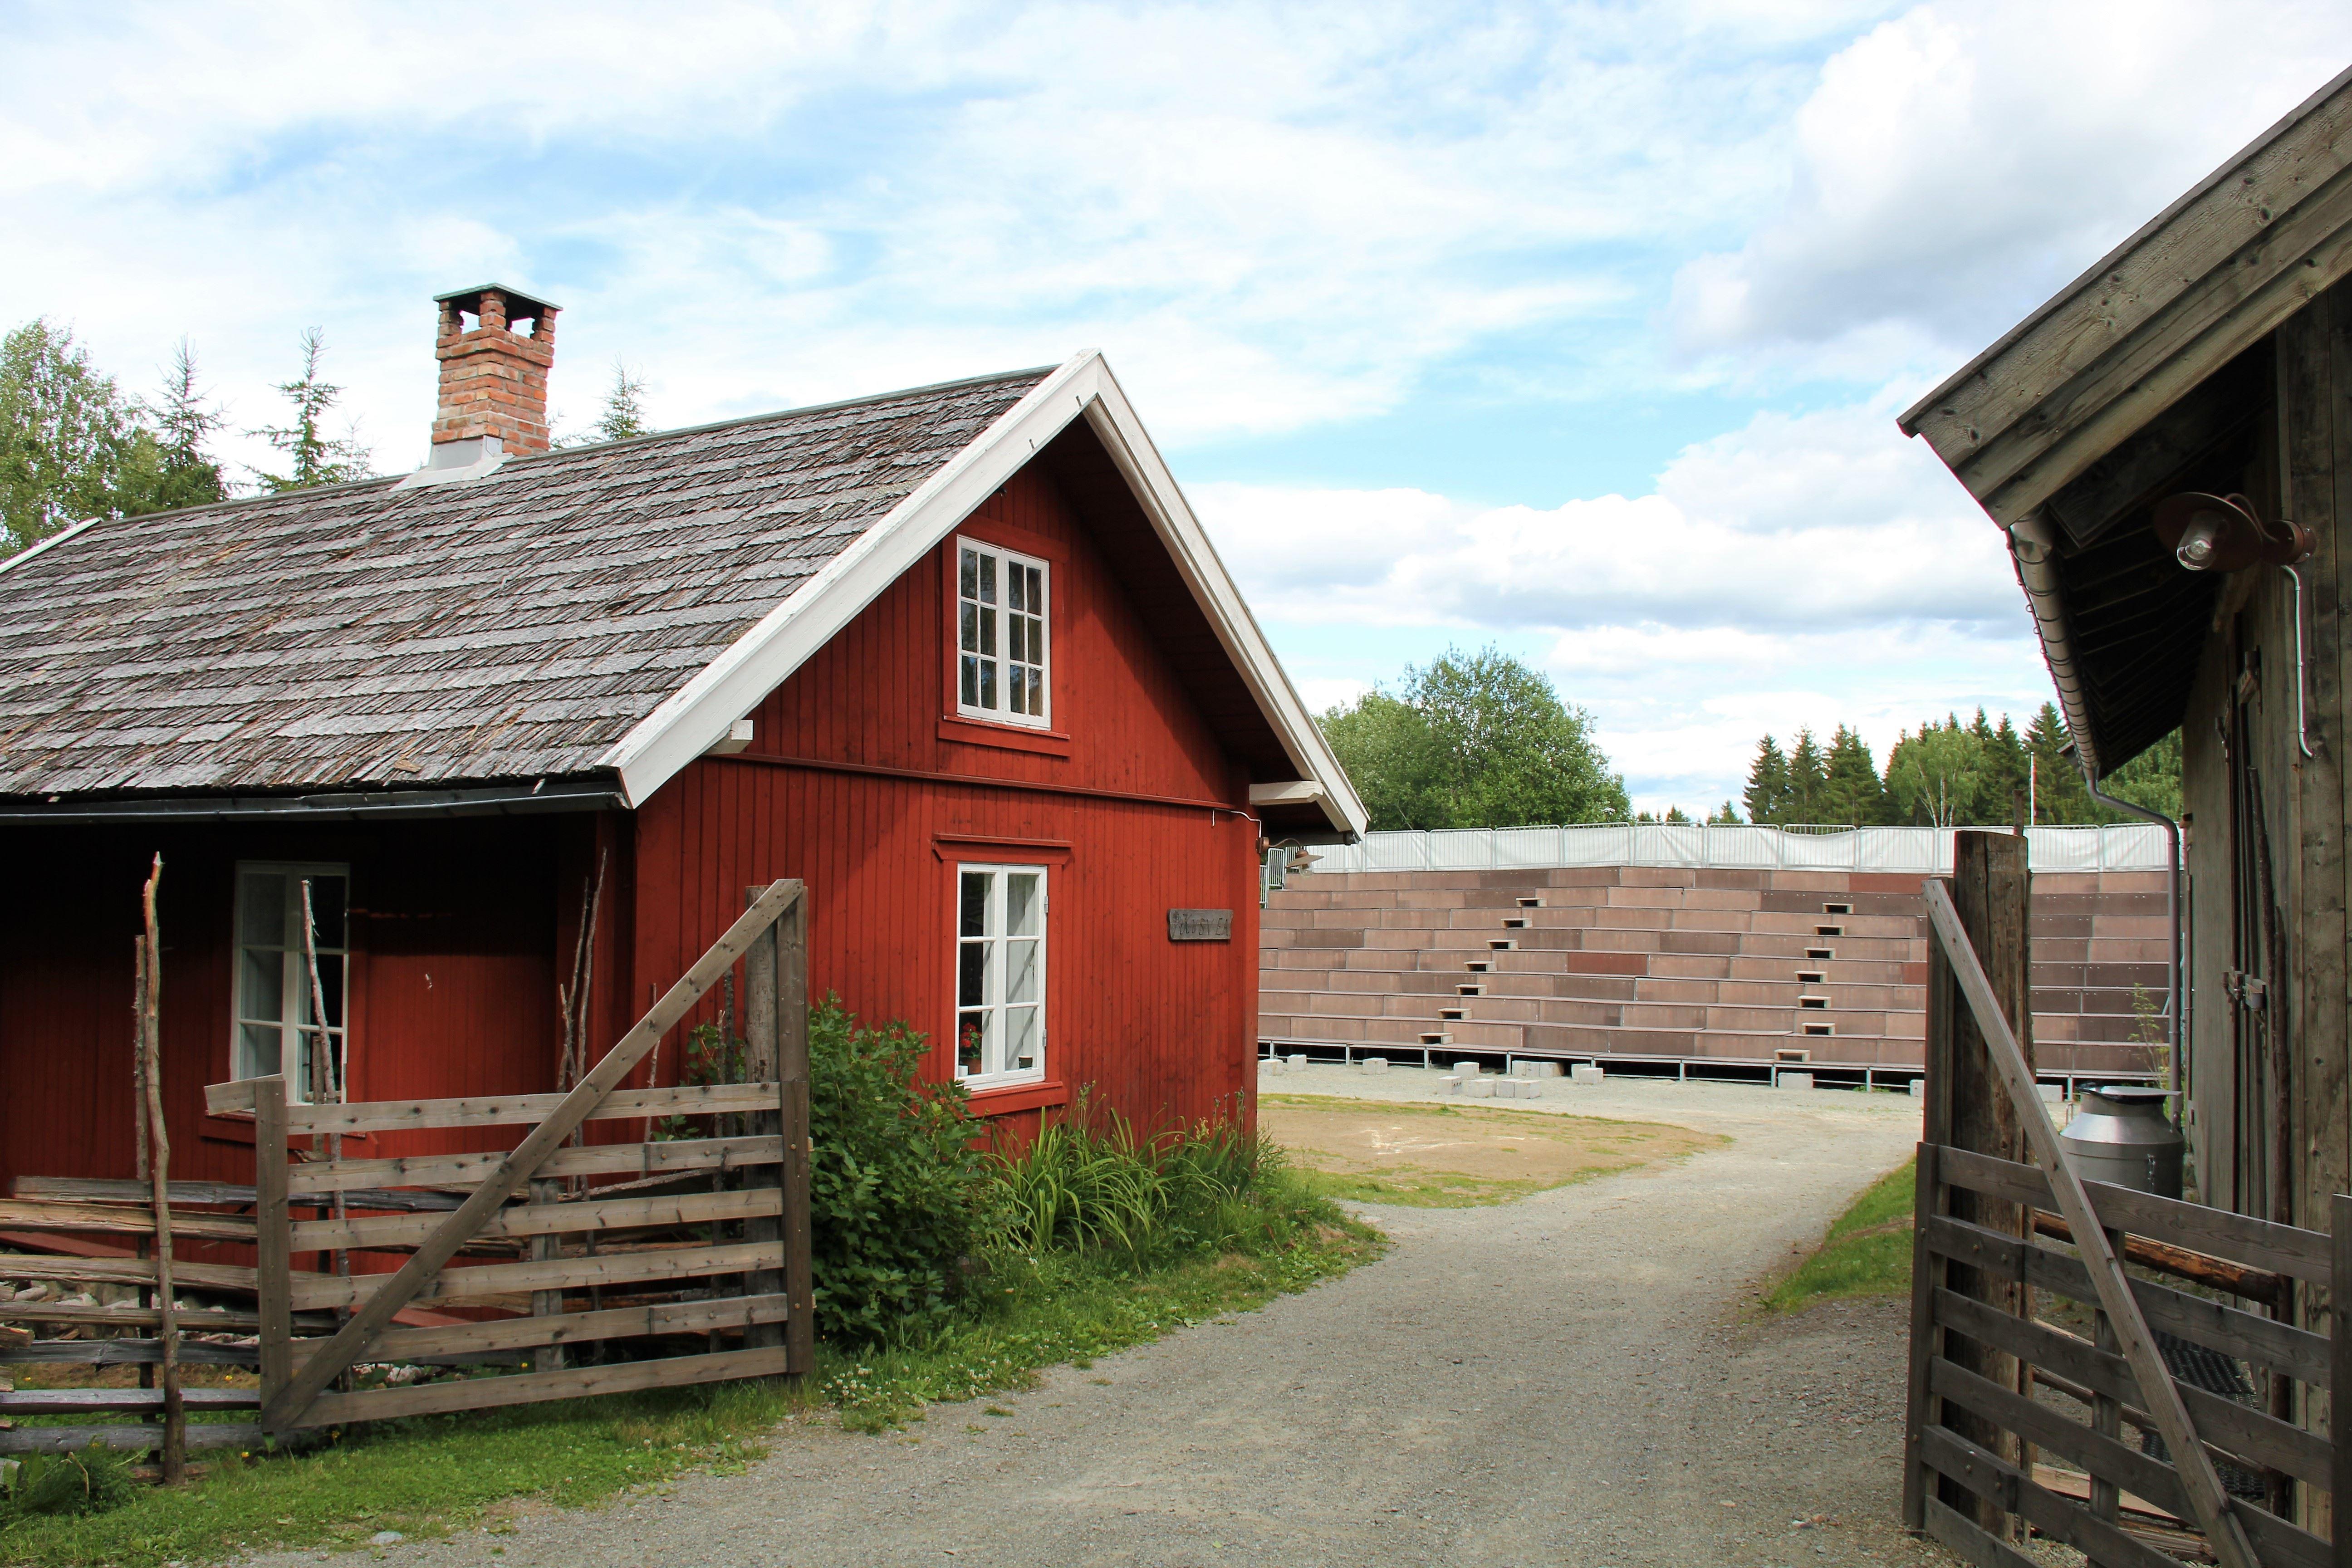 Maria Haukaas Mittet og Lars Bremnes